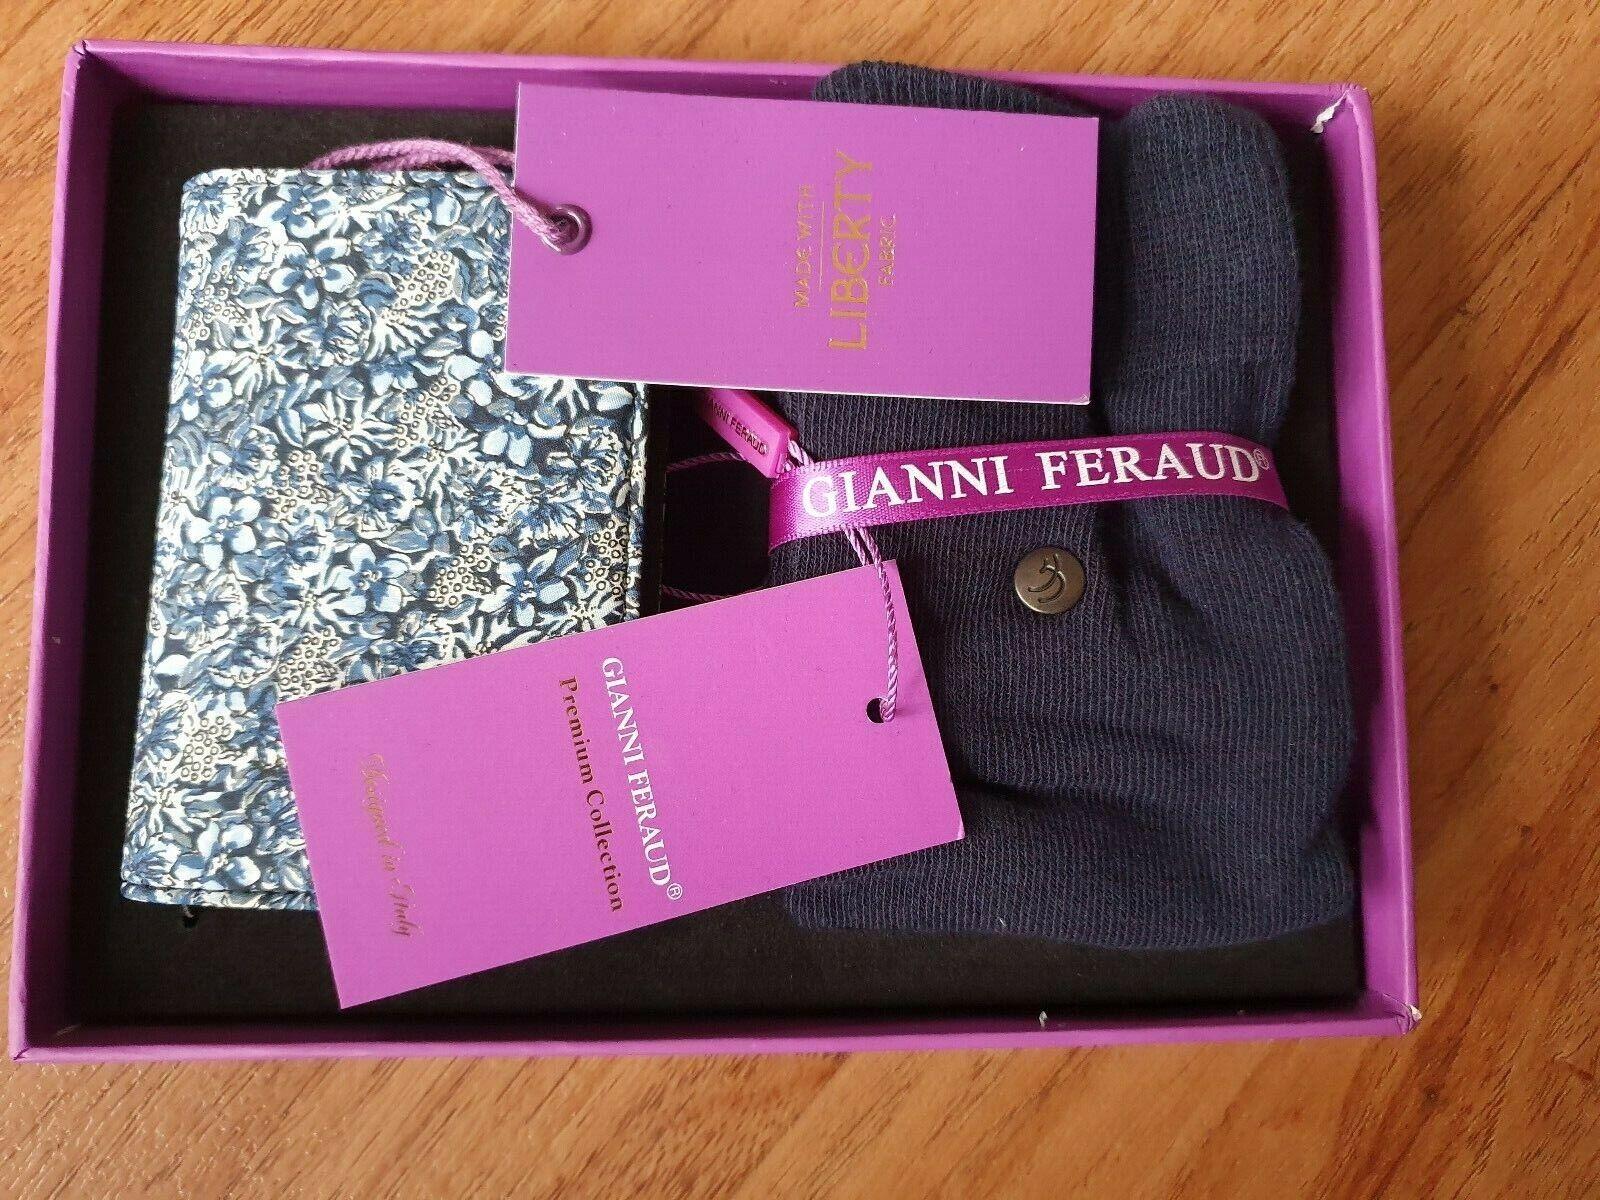 GIANNI FERAUD LIBERTY Print Card Holder & Socks Blue Gift Set Boxed Rrp